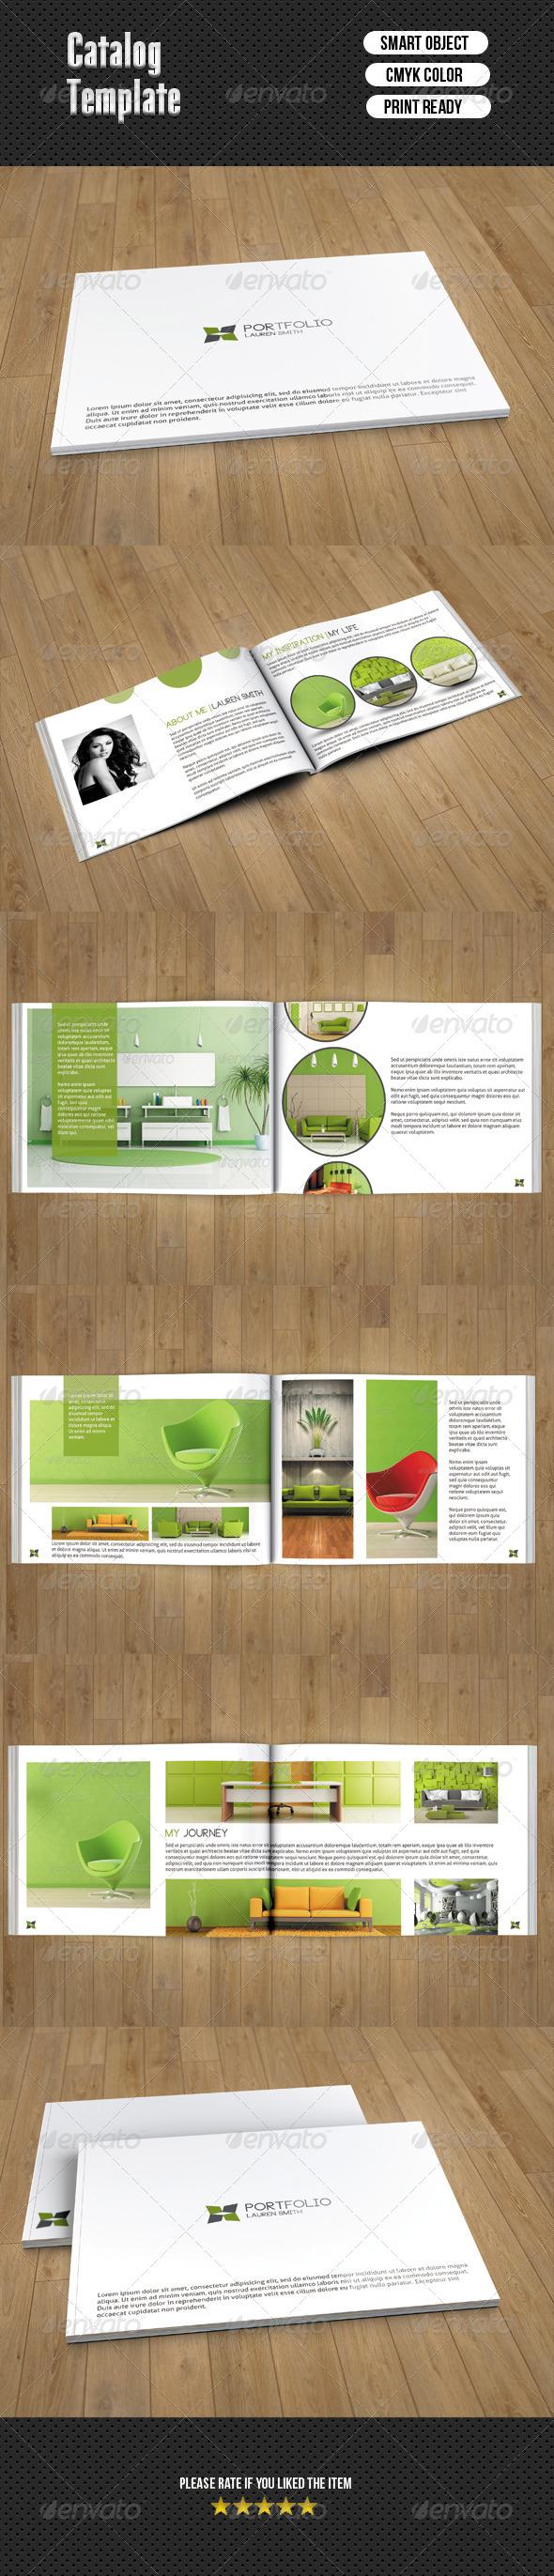 Portfolio Catalog - 10 Pages - Catalogs Brochures